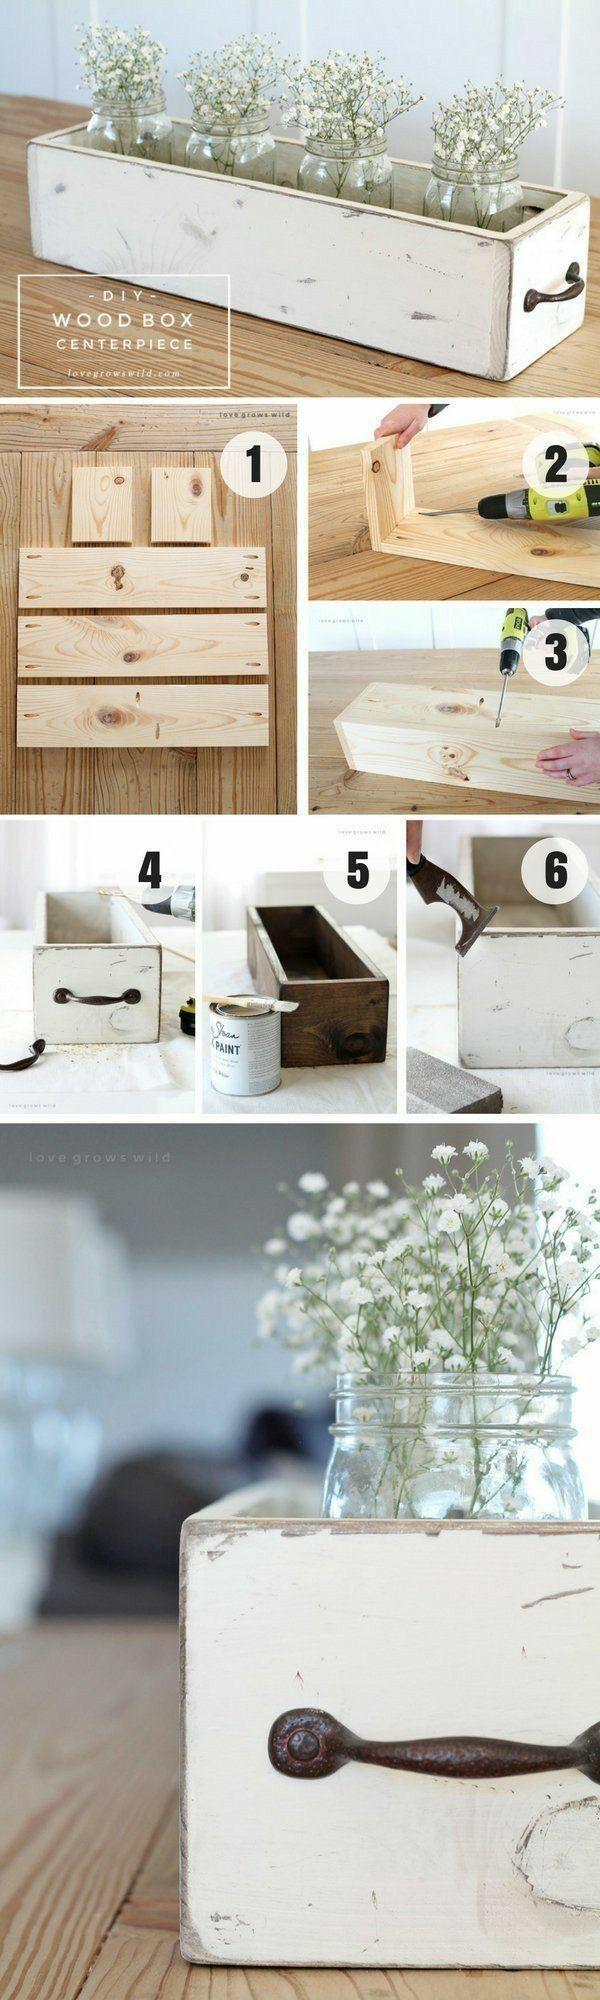 Diy wood shelf box. A rustic touch. | Home Improvement Ideas | Pinterest